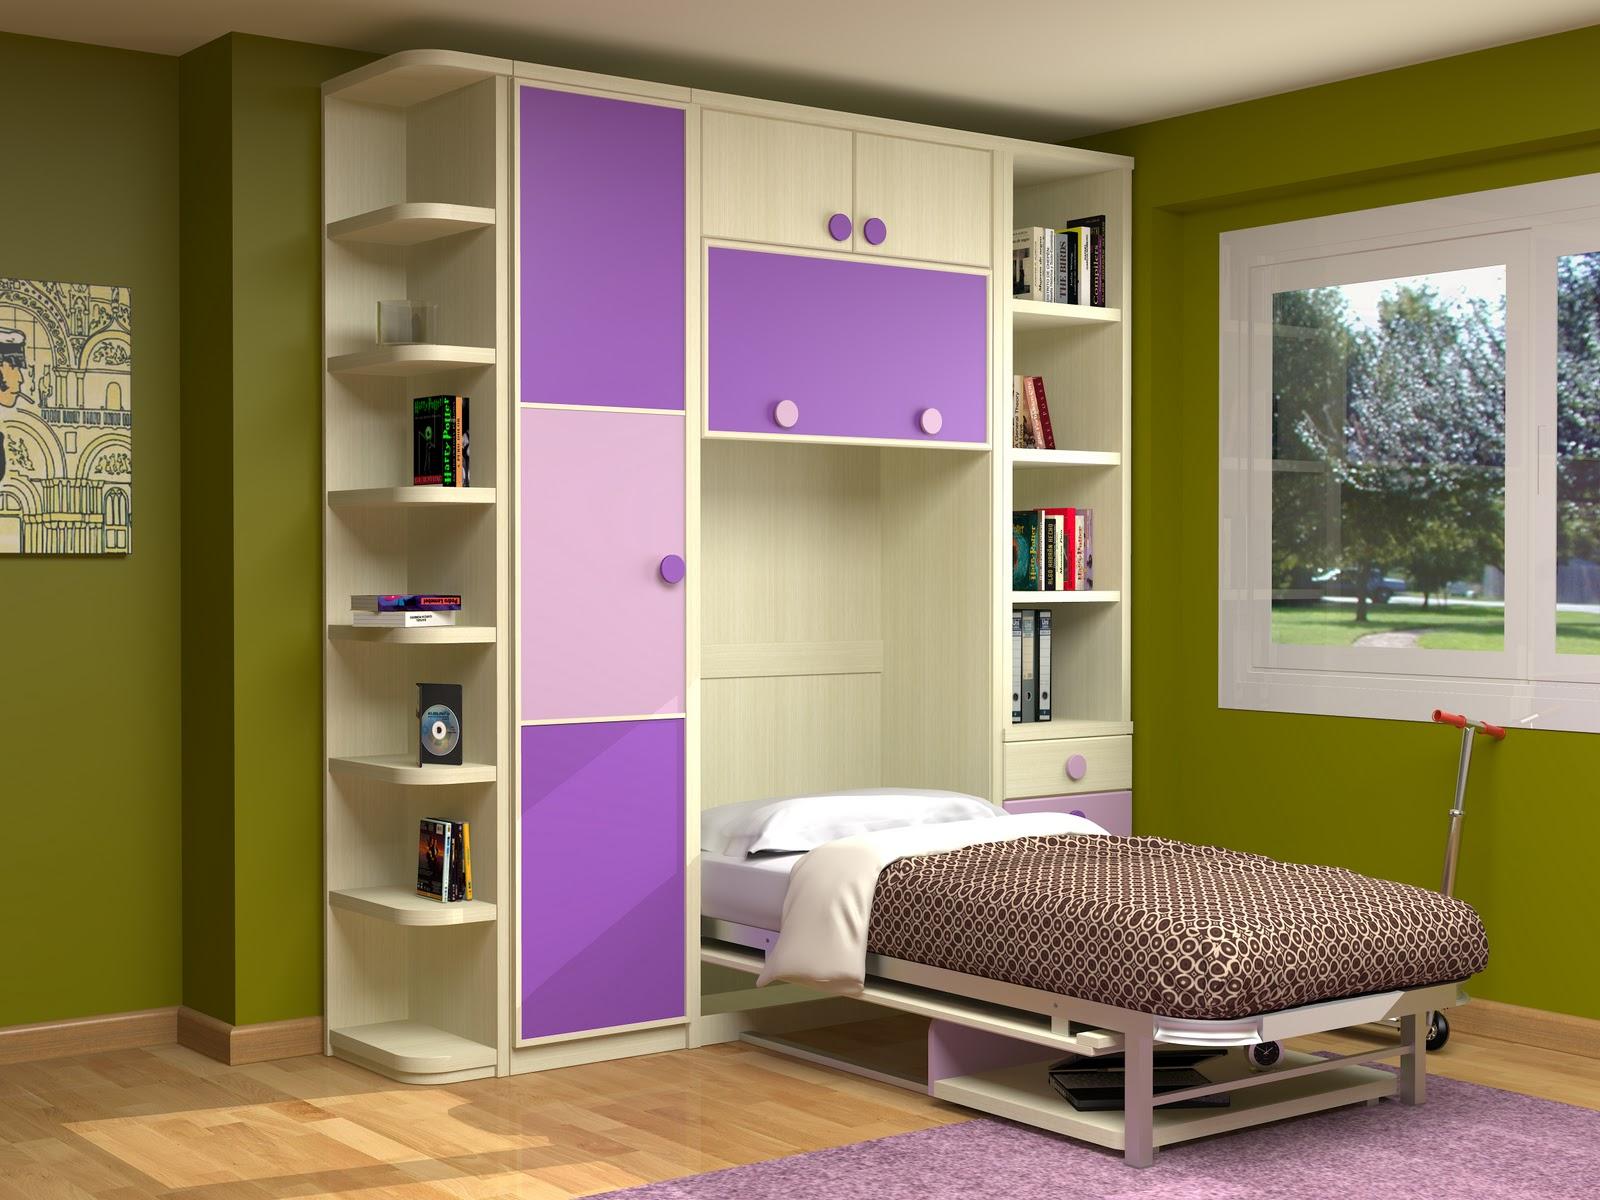 Cama abatible vertical con escritorio incorporado - Cama abatible escritorio ...